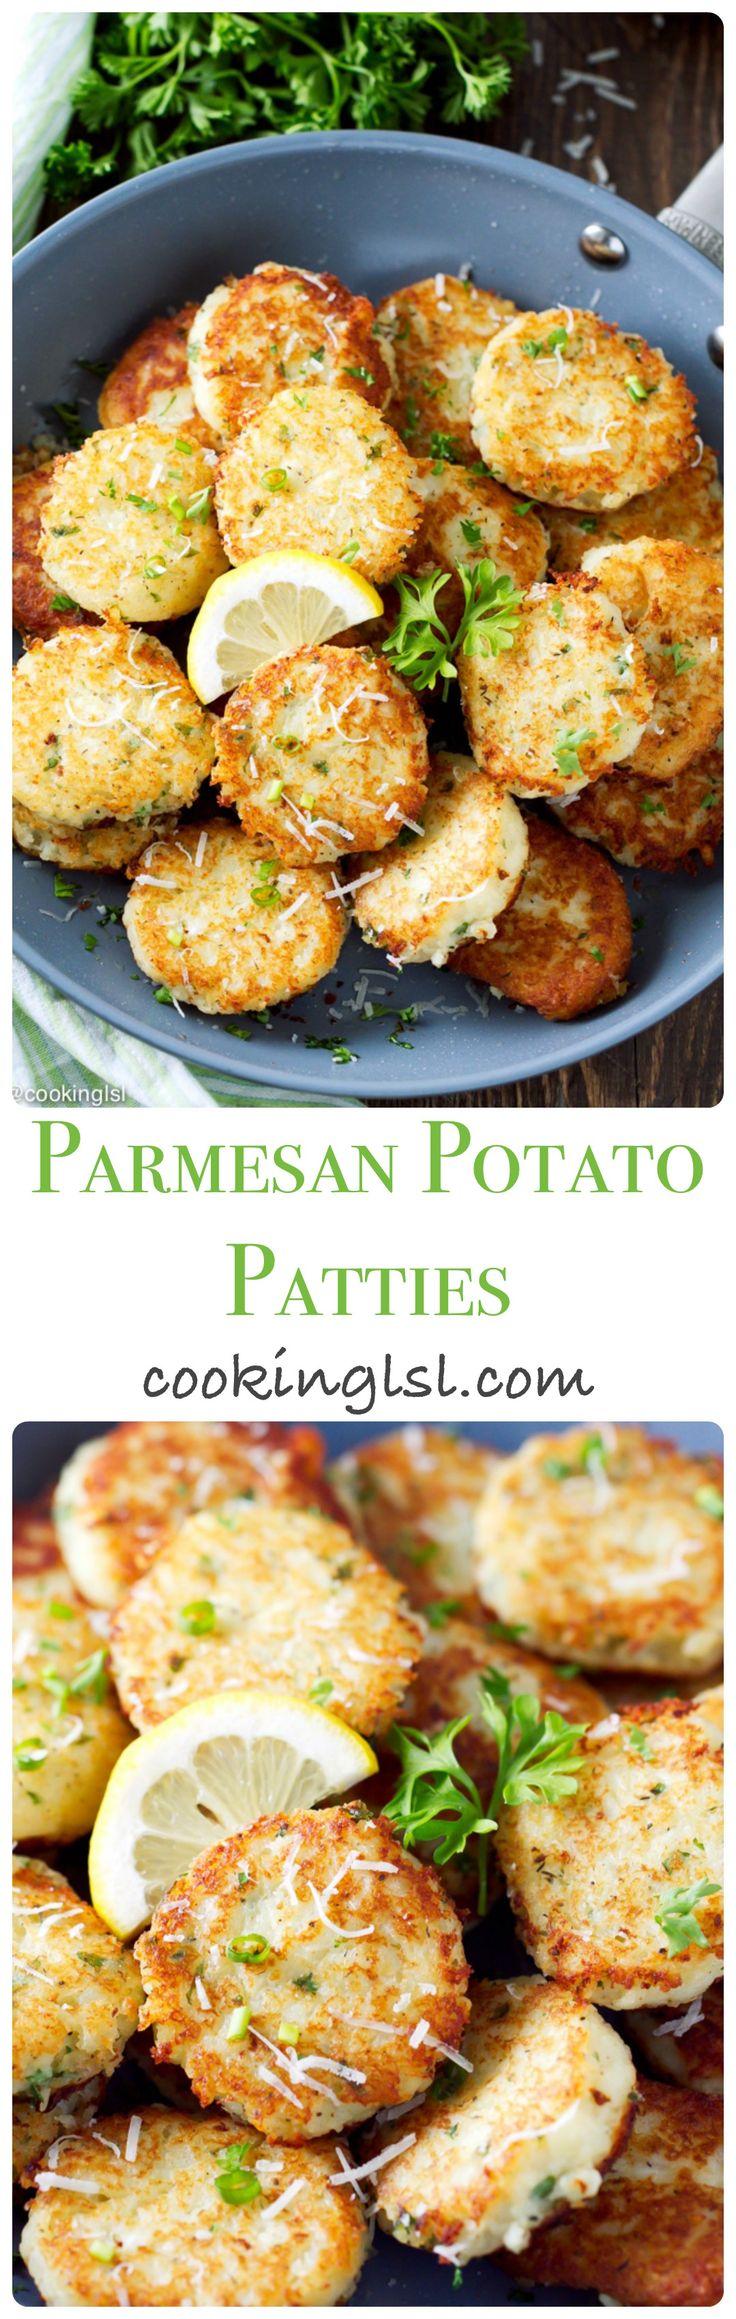 Best 25 american food ideas on pinterest american recipes parmesan potato patties forumfinder Choice Image